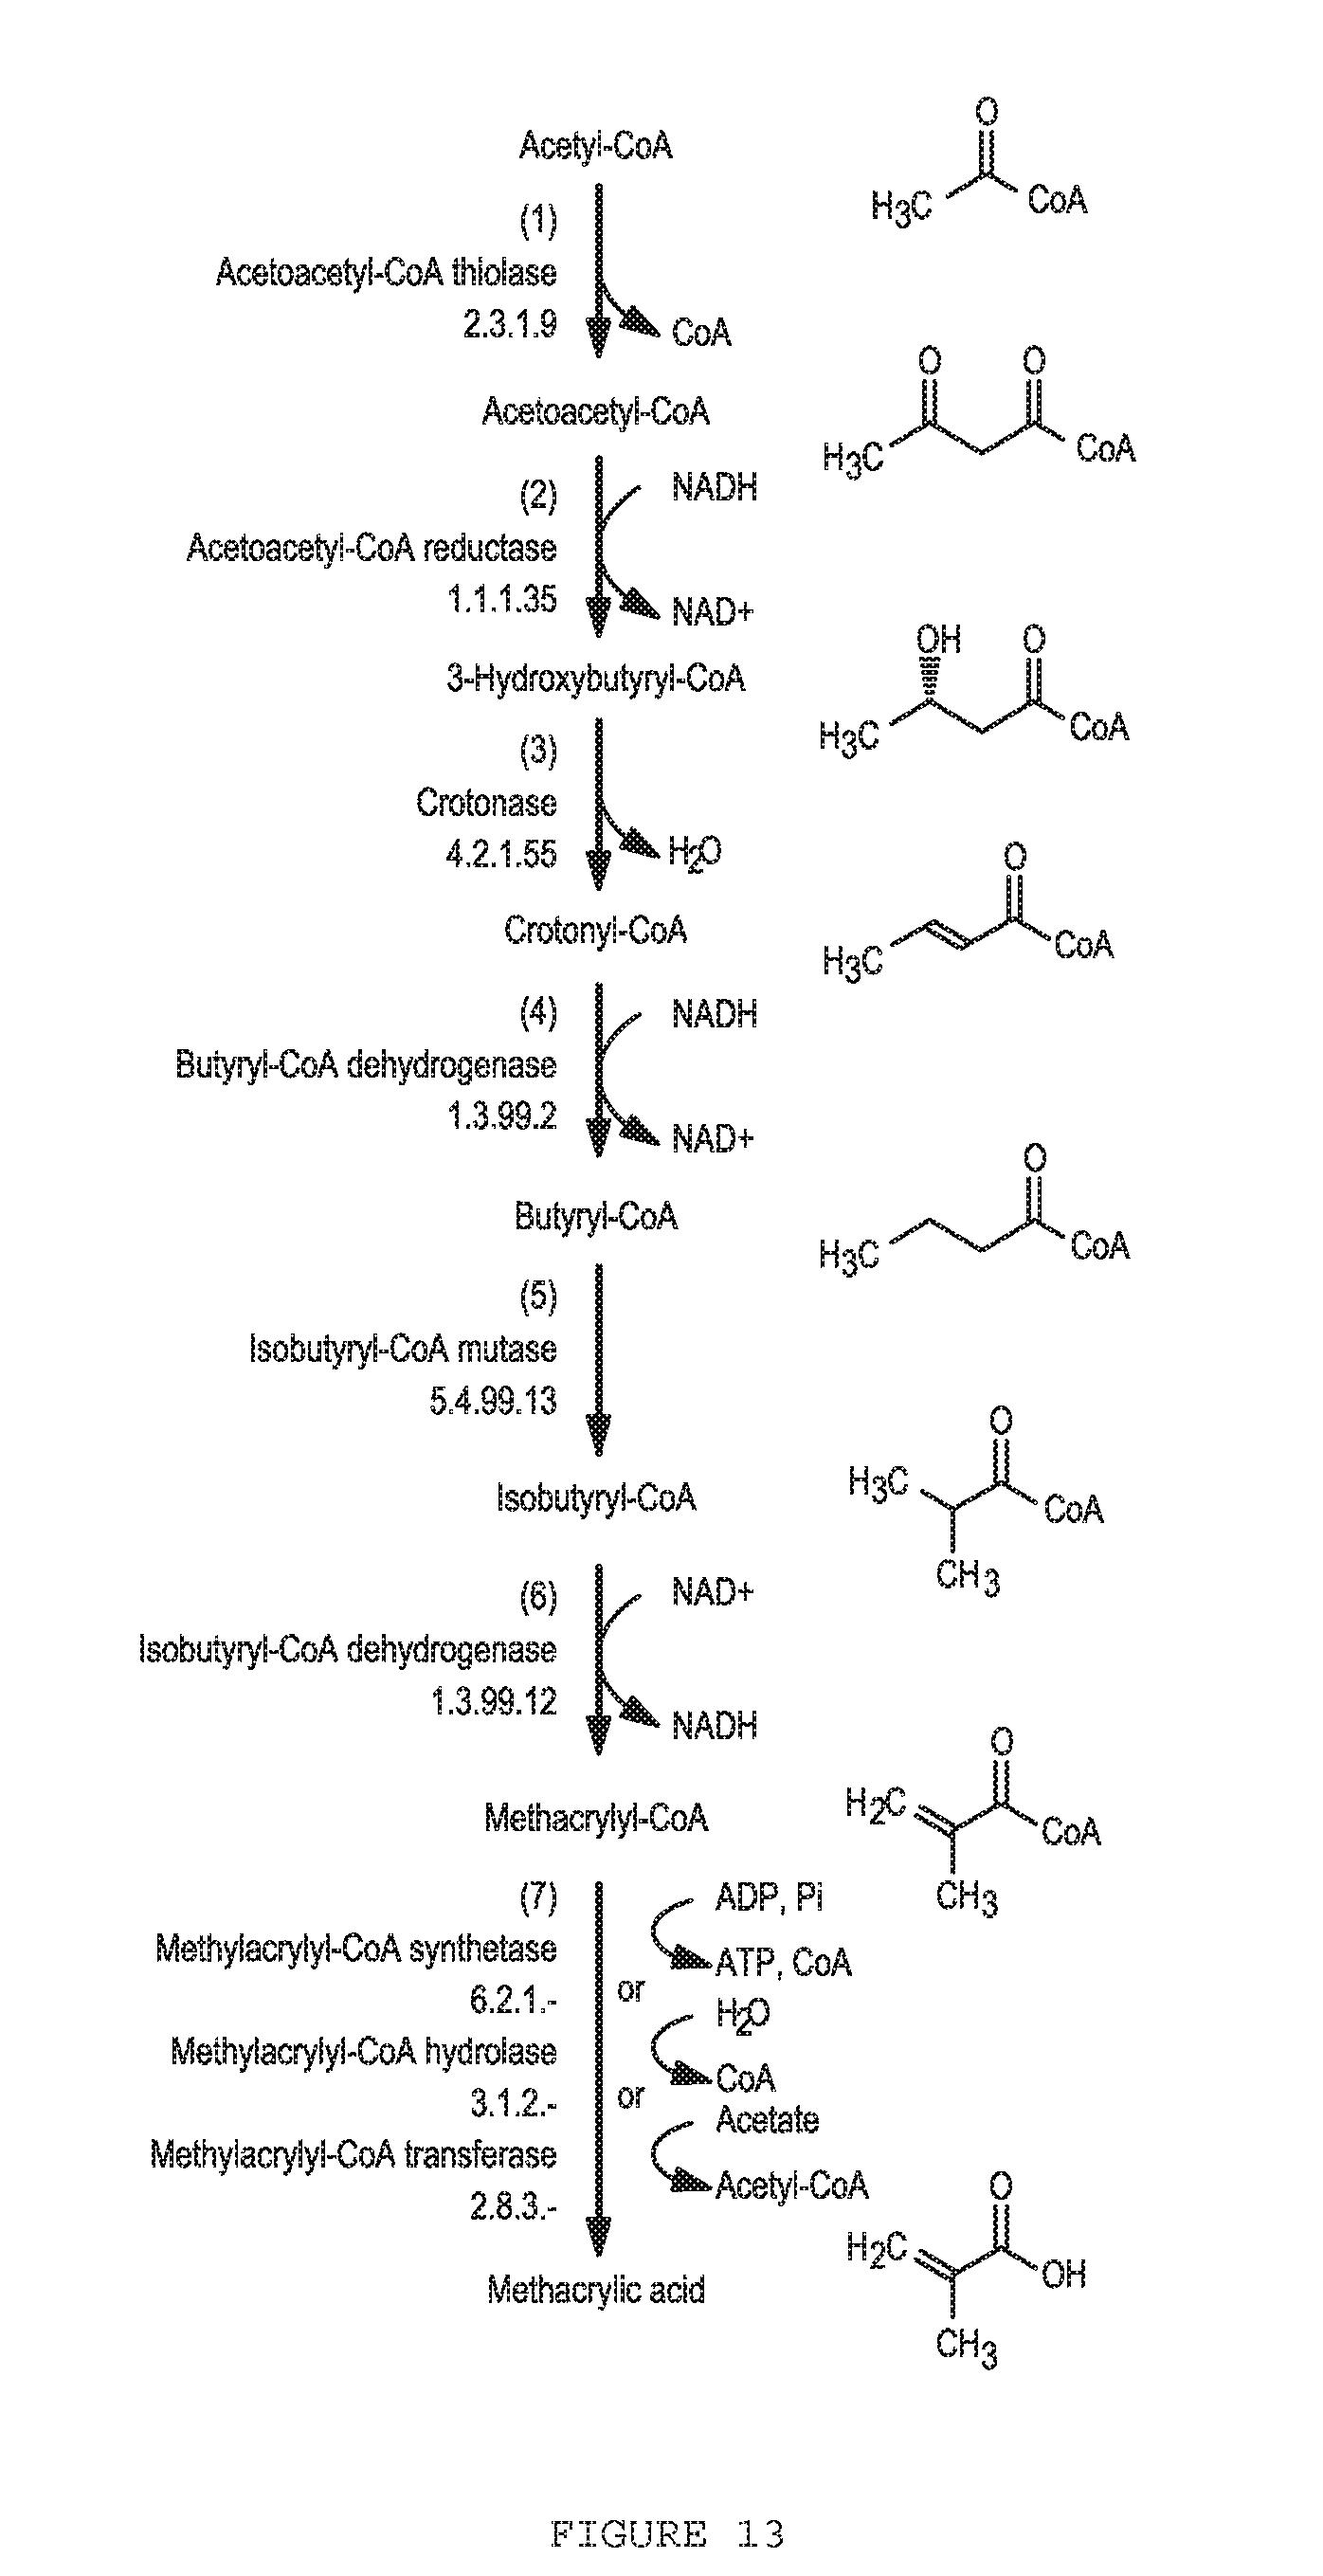 Patent US 9,951,355 B2